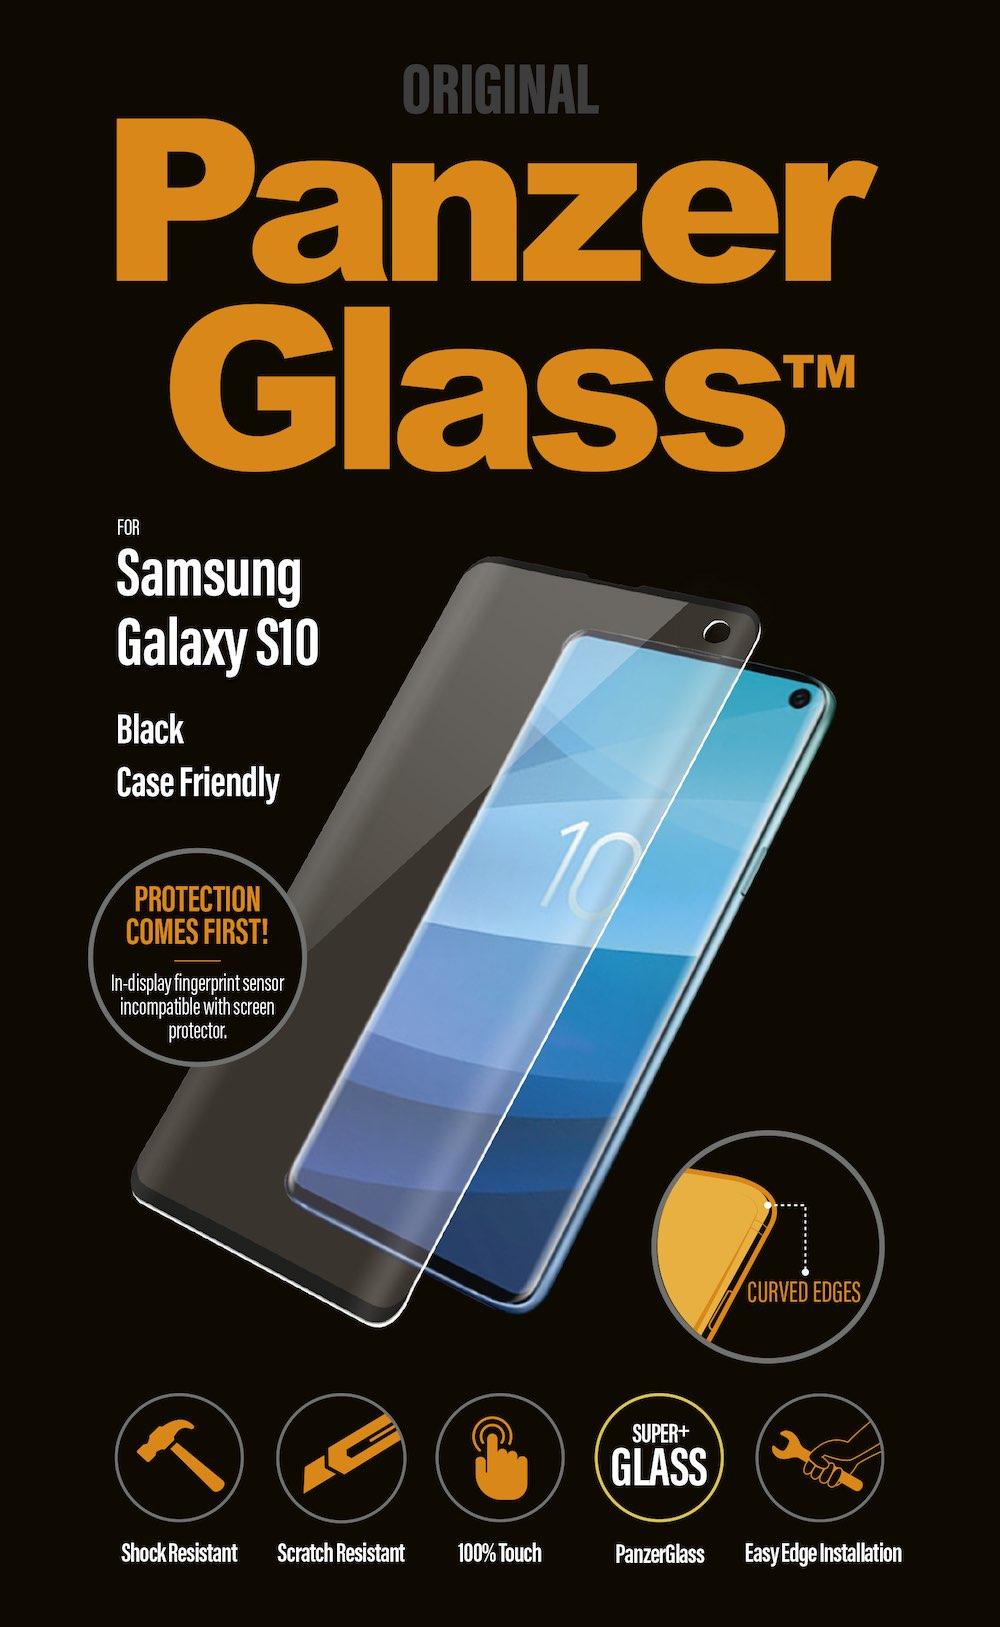 7175_PanzerGlass Samsung Galaxy_S10_GLASS_no_Hole.indd